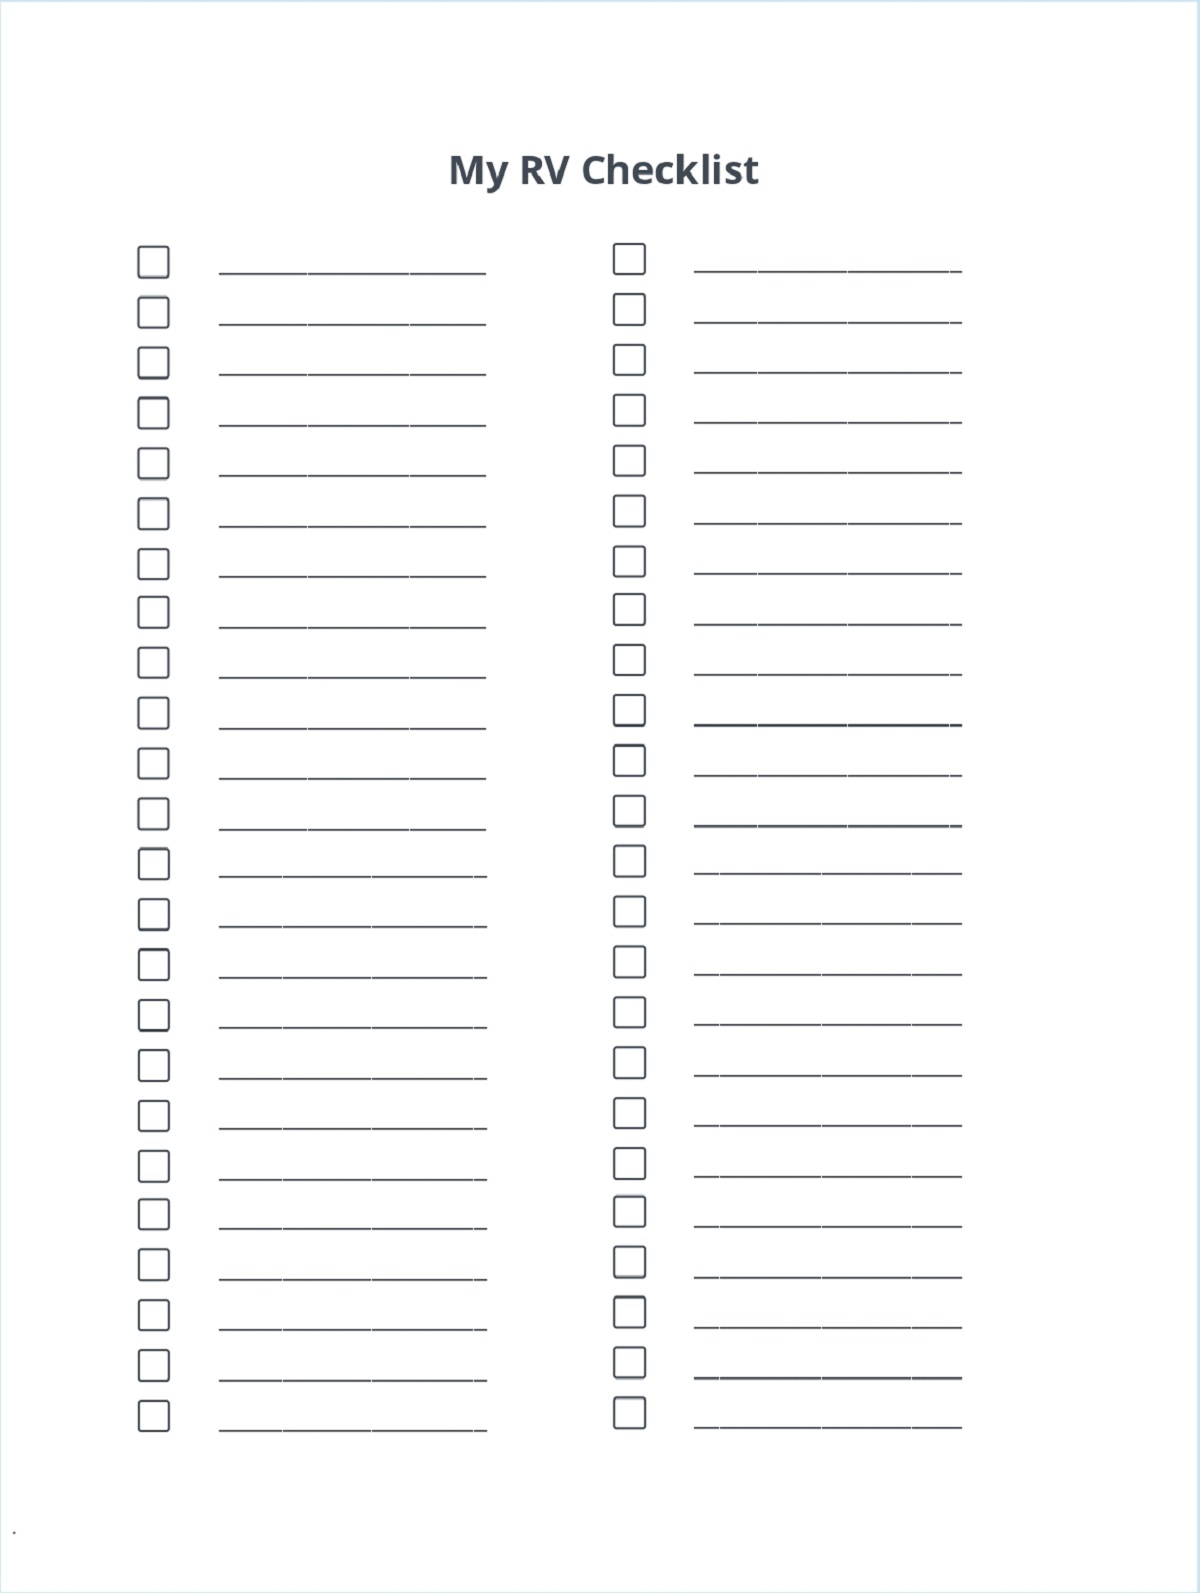 Blank RV Camping Checklist Template